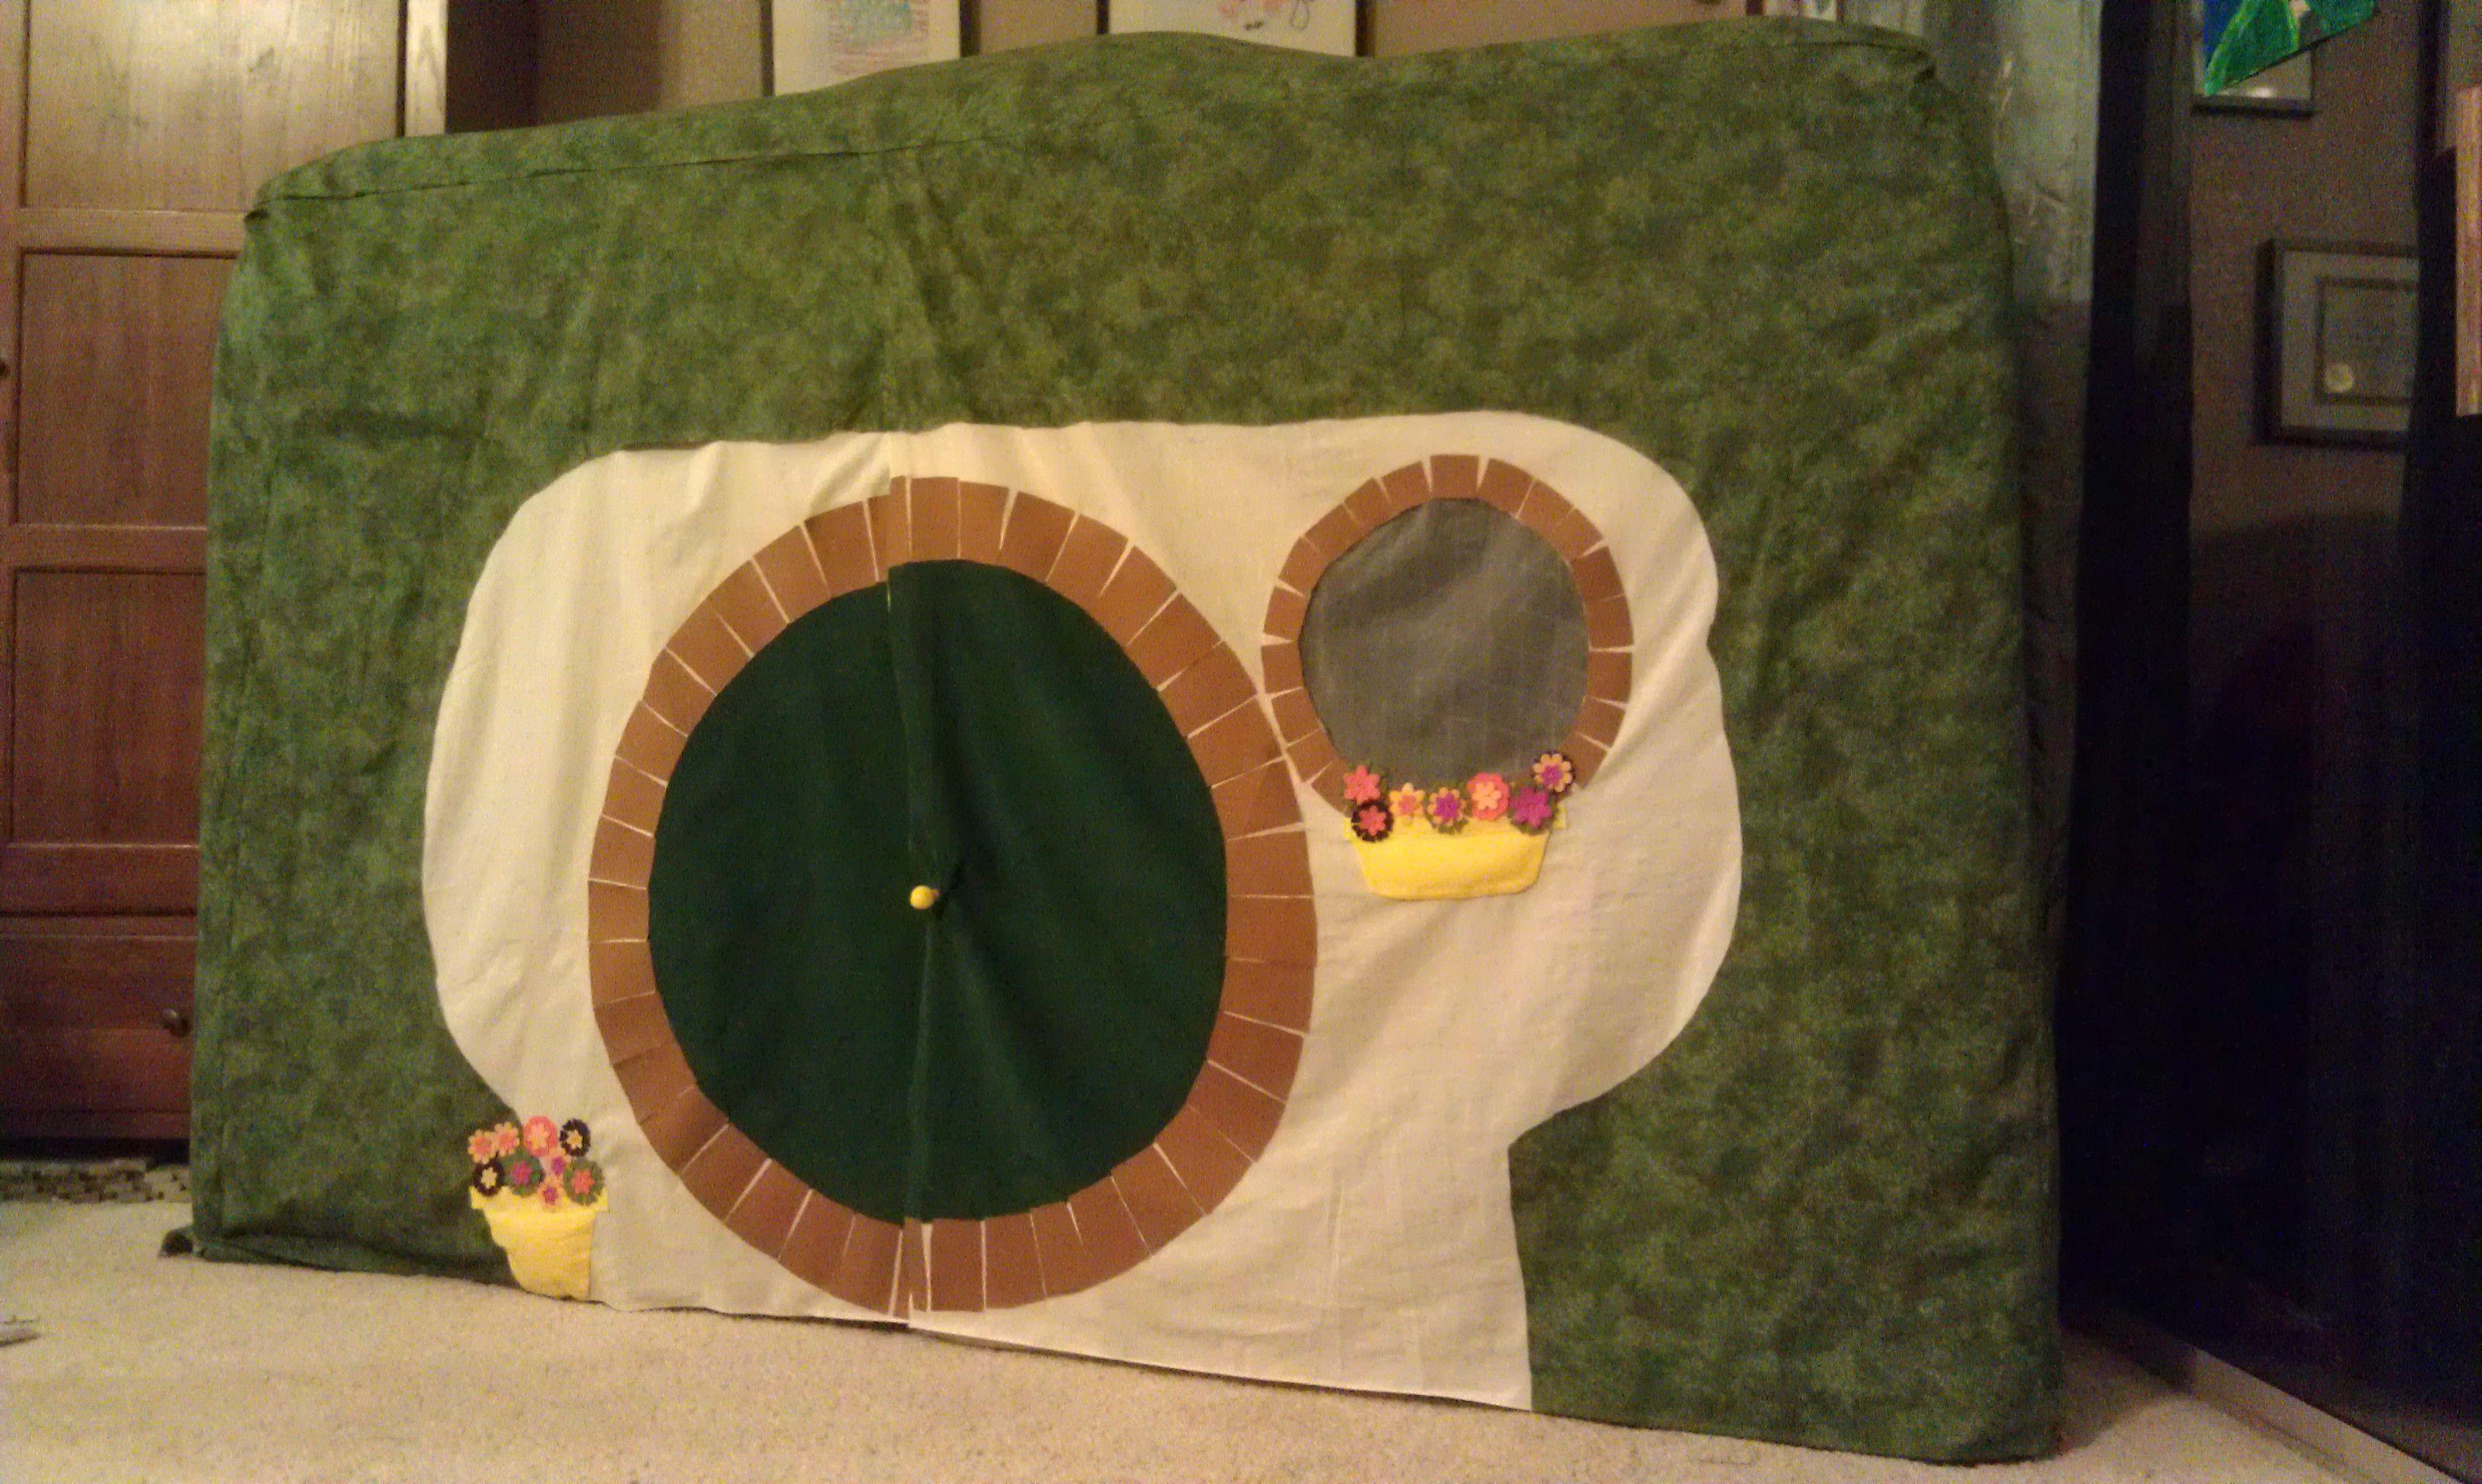 Hobbit Hole sewn to cover a hockey net